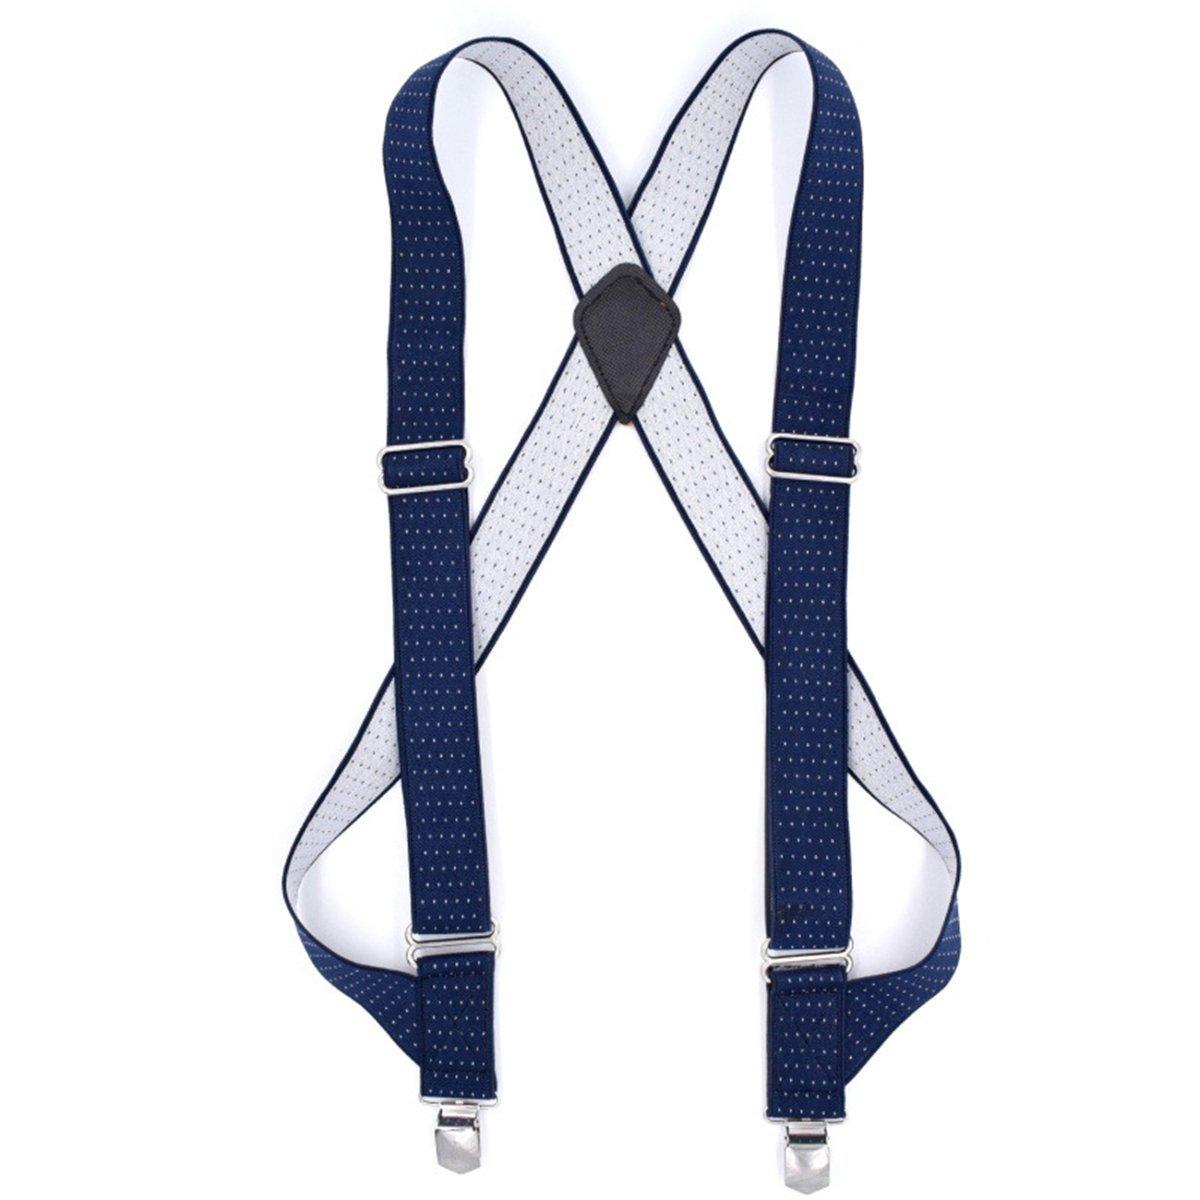 Hip-clip Undergarment 1.4'' Wide Trucker Style Comfort Suspenders Metal No-slip Clips (Hip-clip Blue)